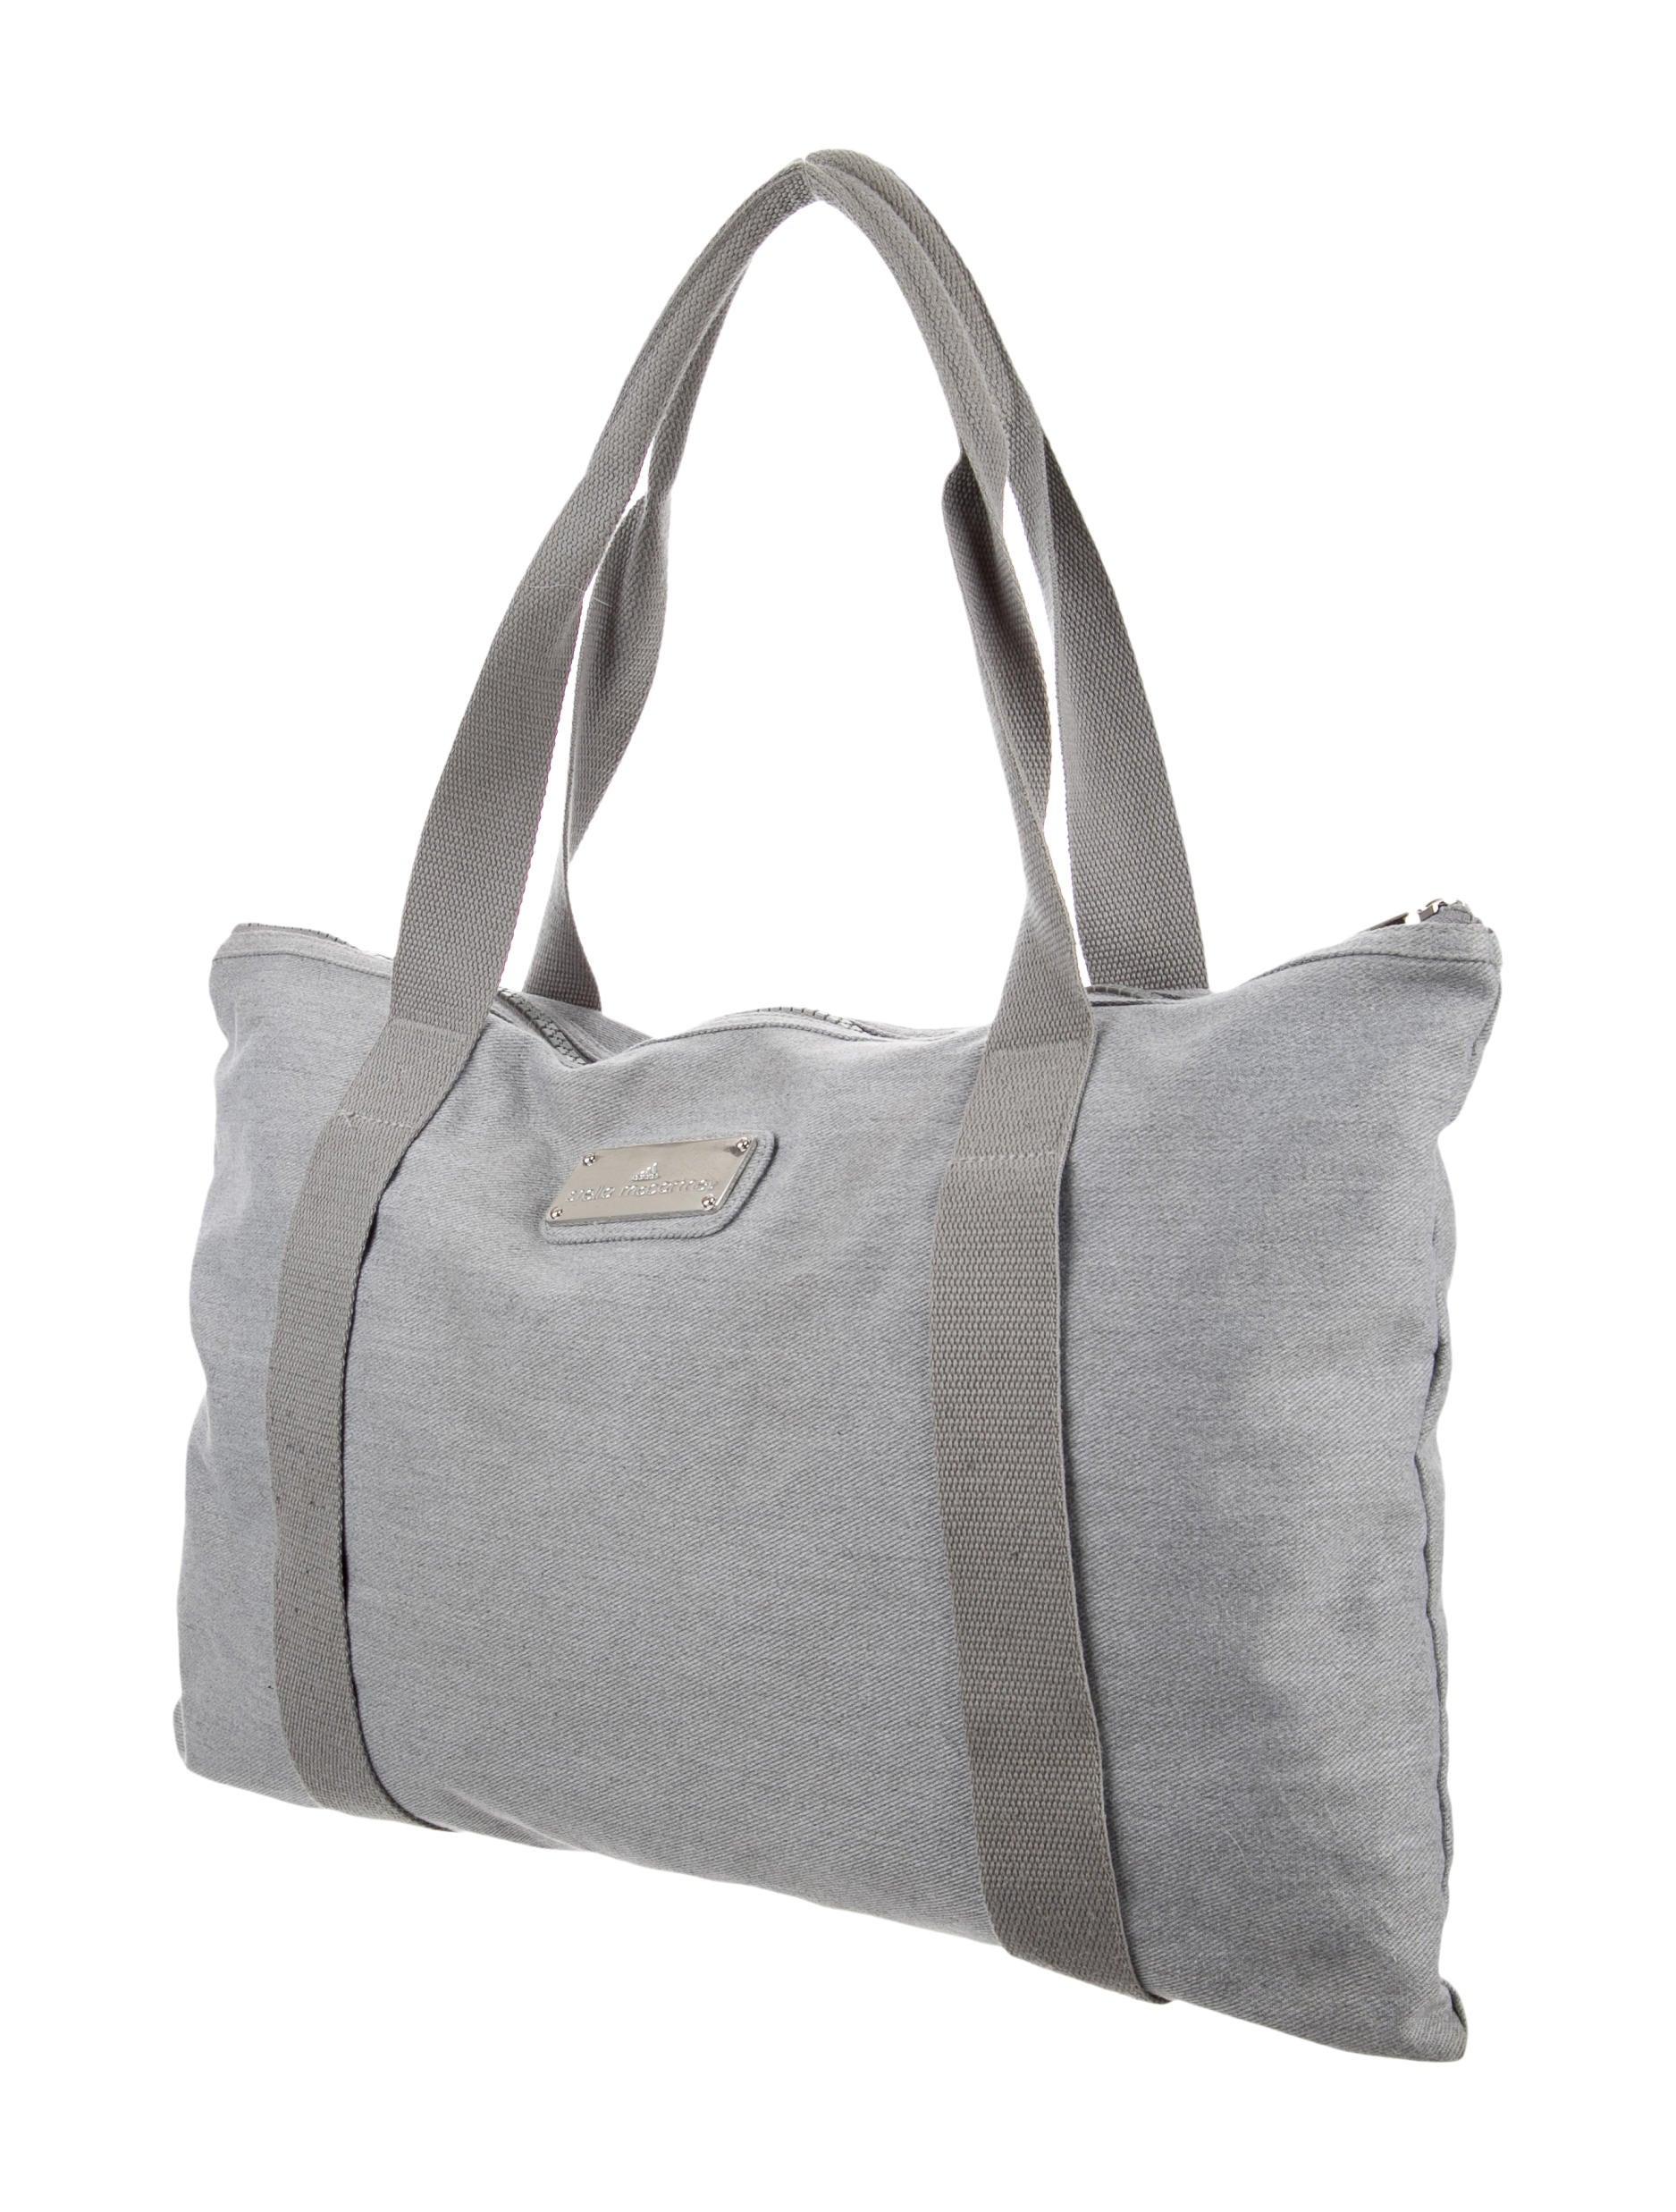 Model BN Adidas Vintage 3 Stripes Mini Small Items Shoulder Bag Mens Women Black White | EBay